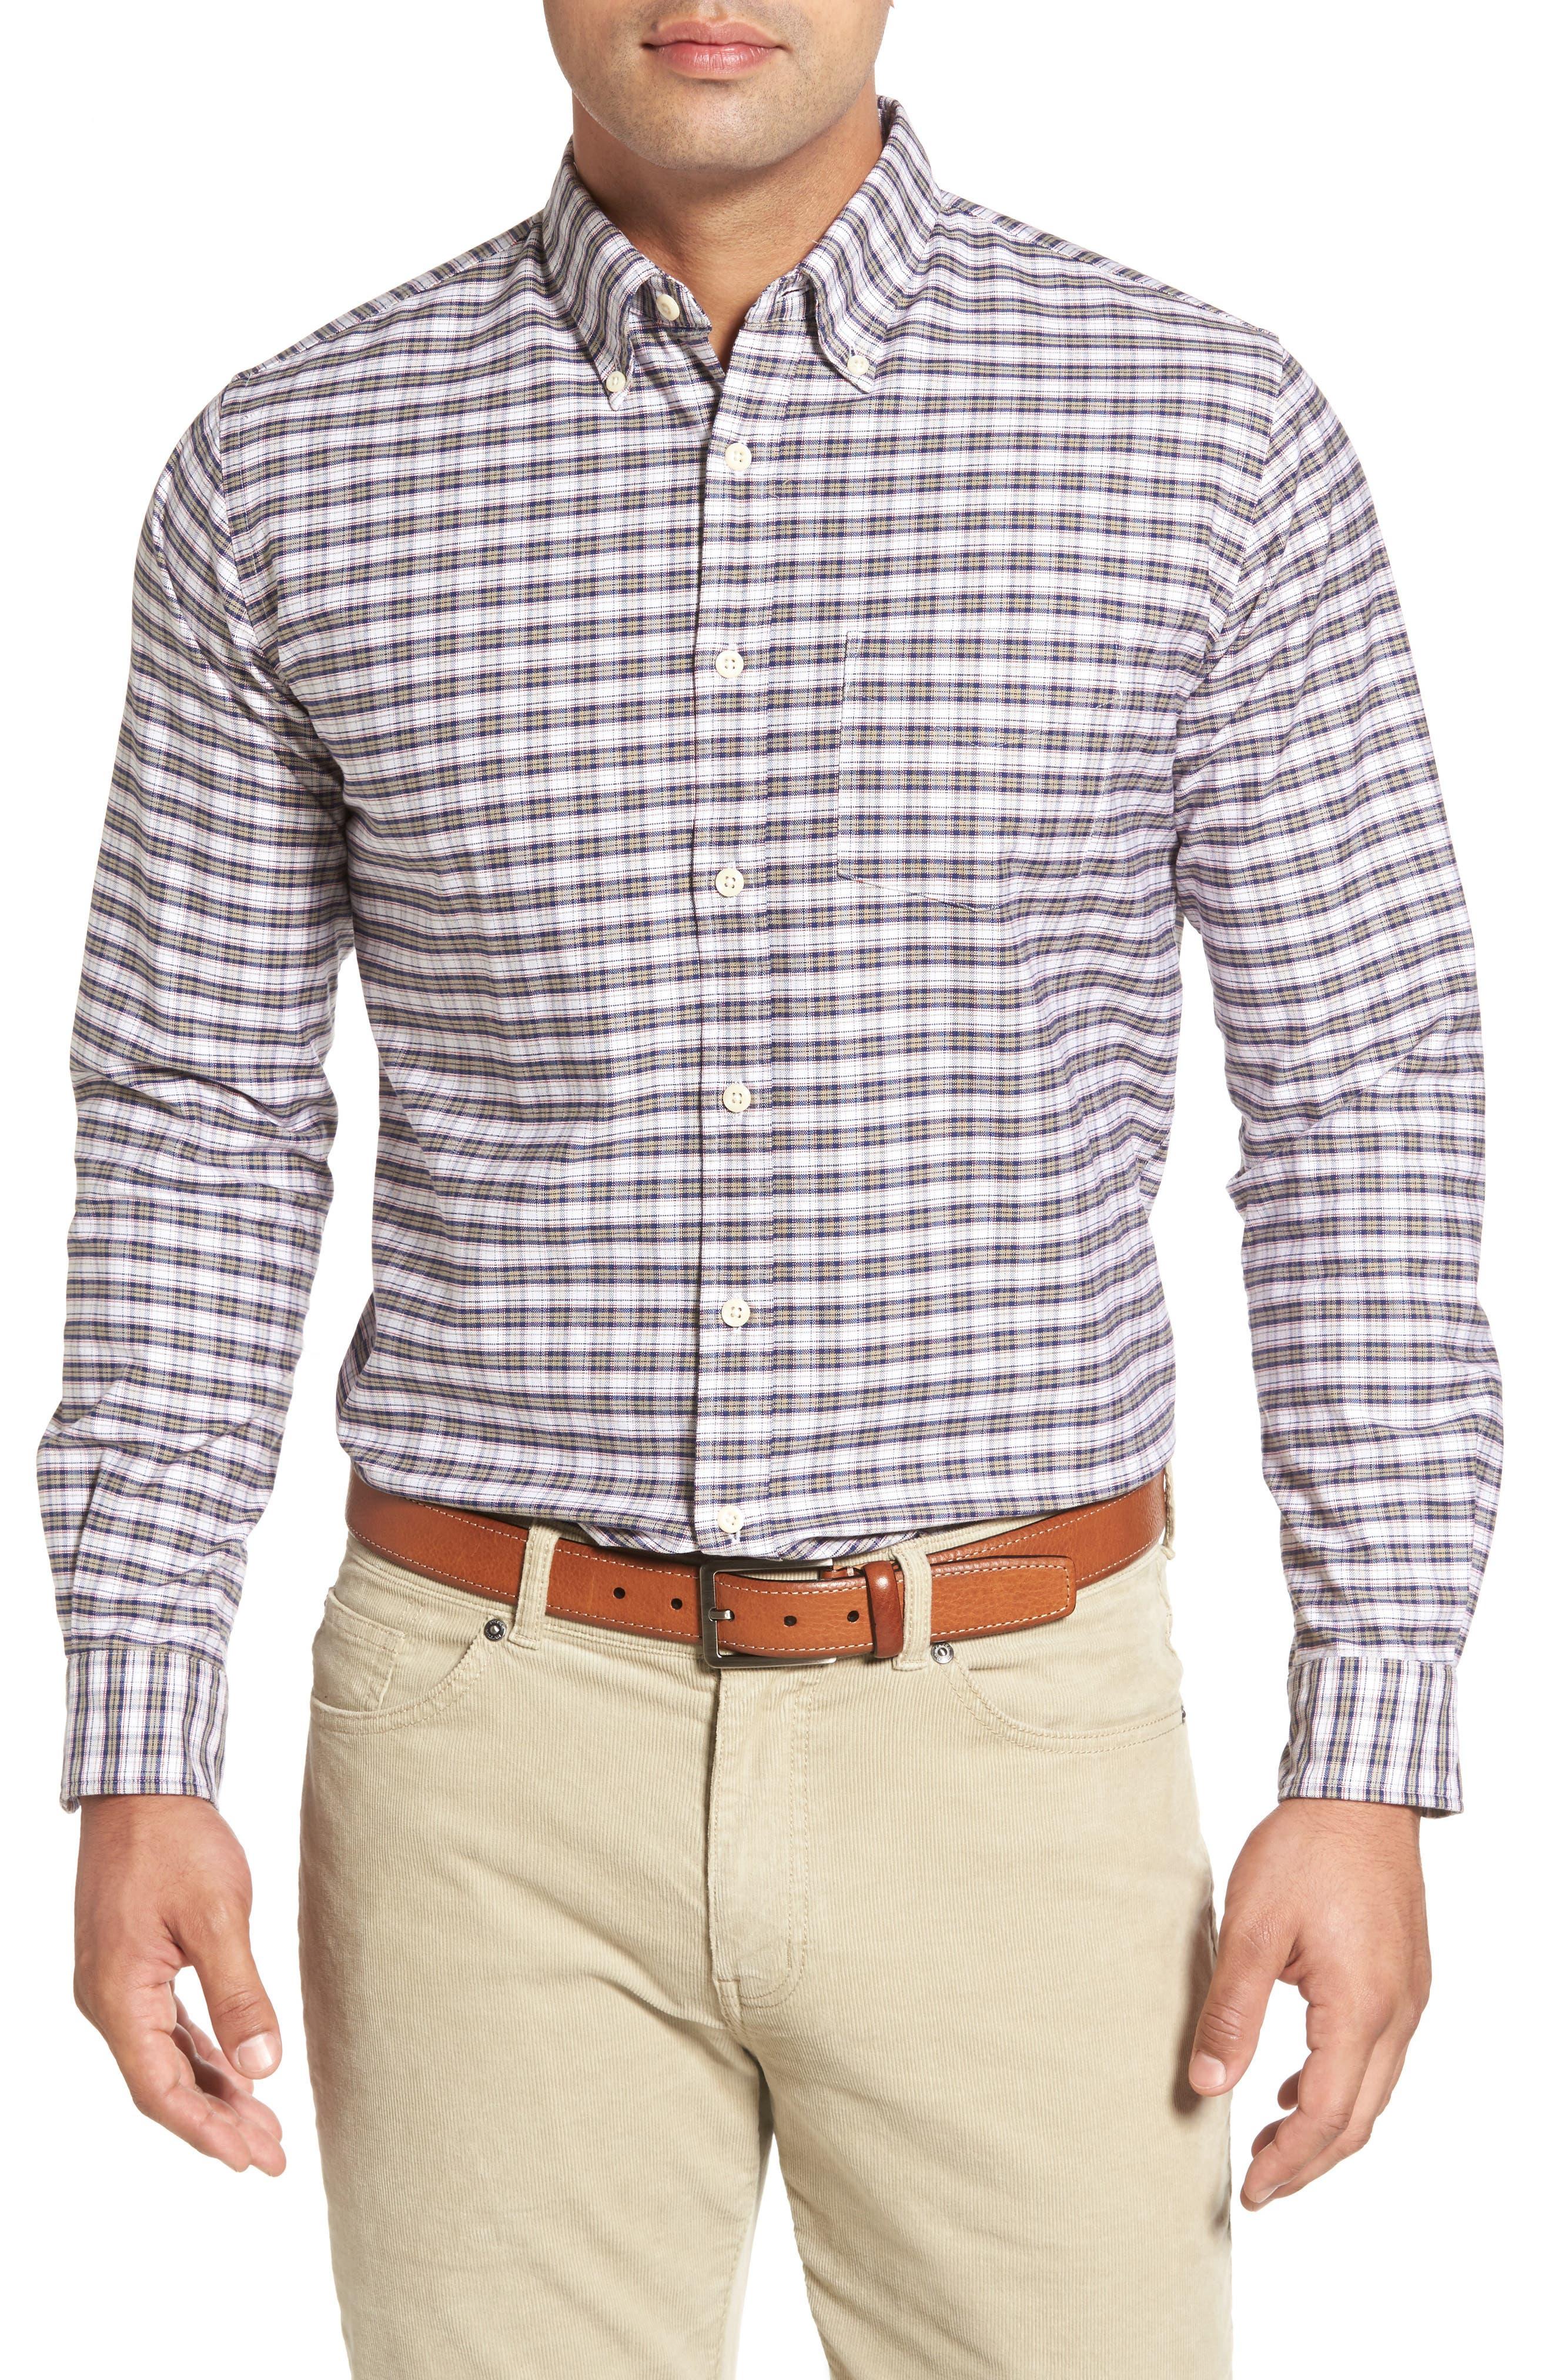 Crown Vintage Plaid Regular Fit Sport Shirt,                             Main thumbnail 1, color,                             Patriot Navy